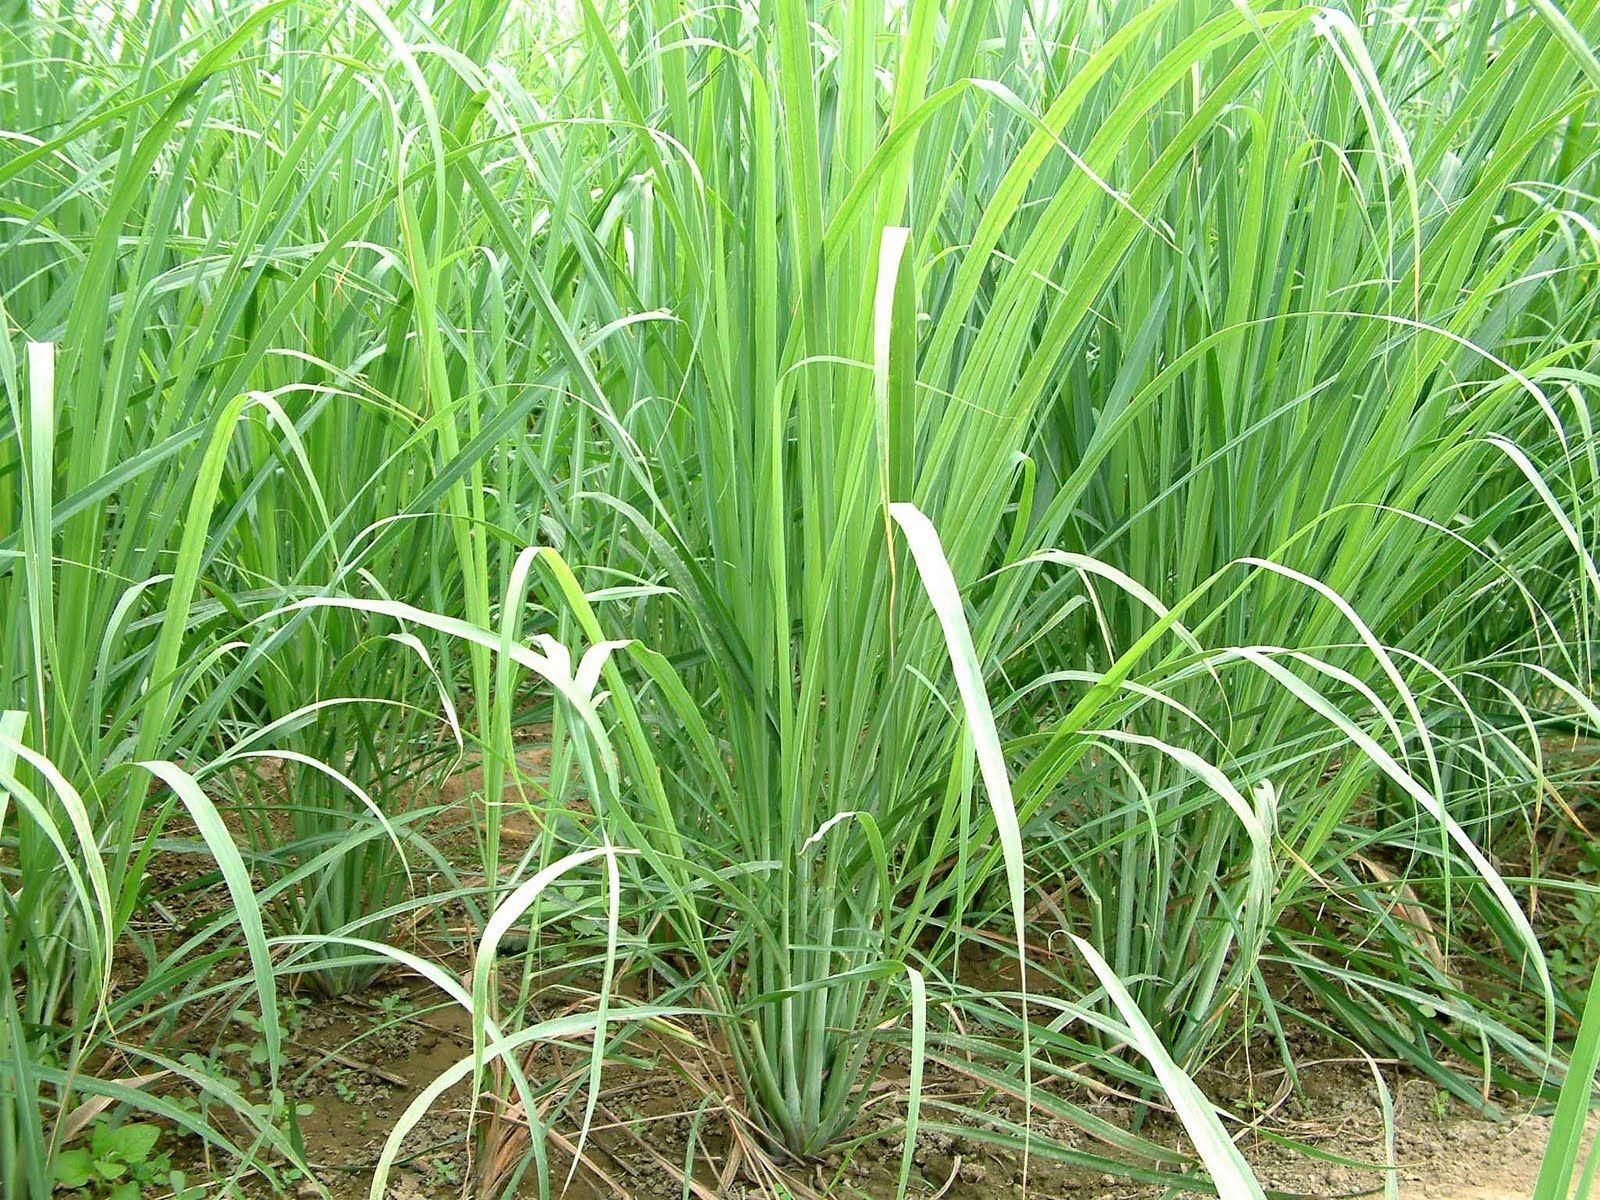 How to grow lemon grass from seed - Cymbopogon Lemongrass Citronella Grass